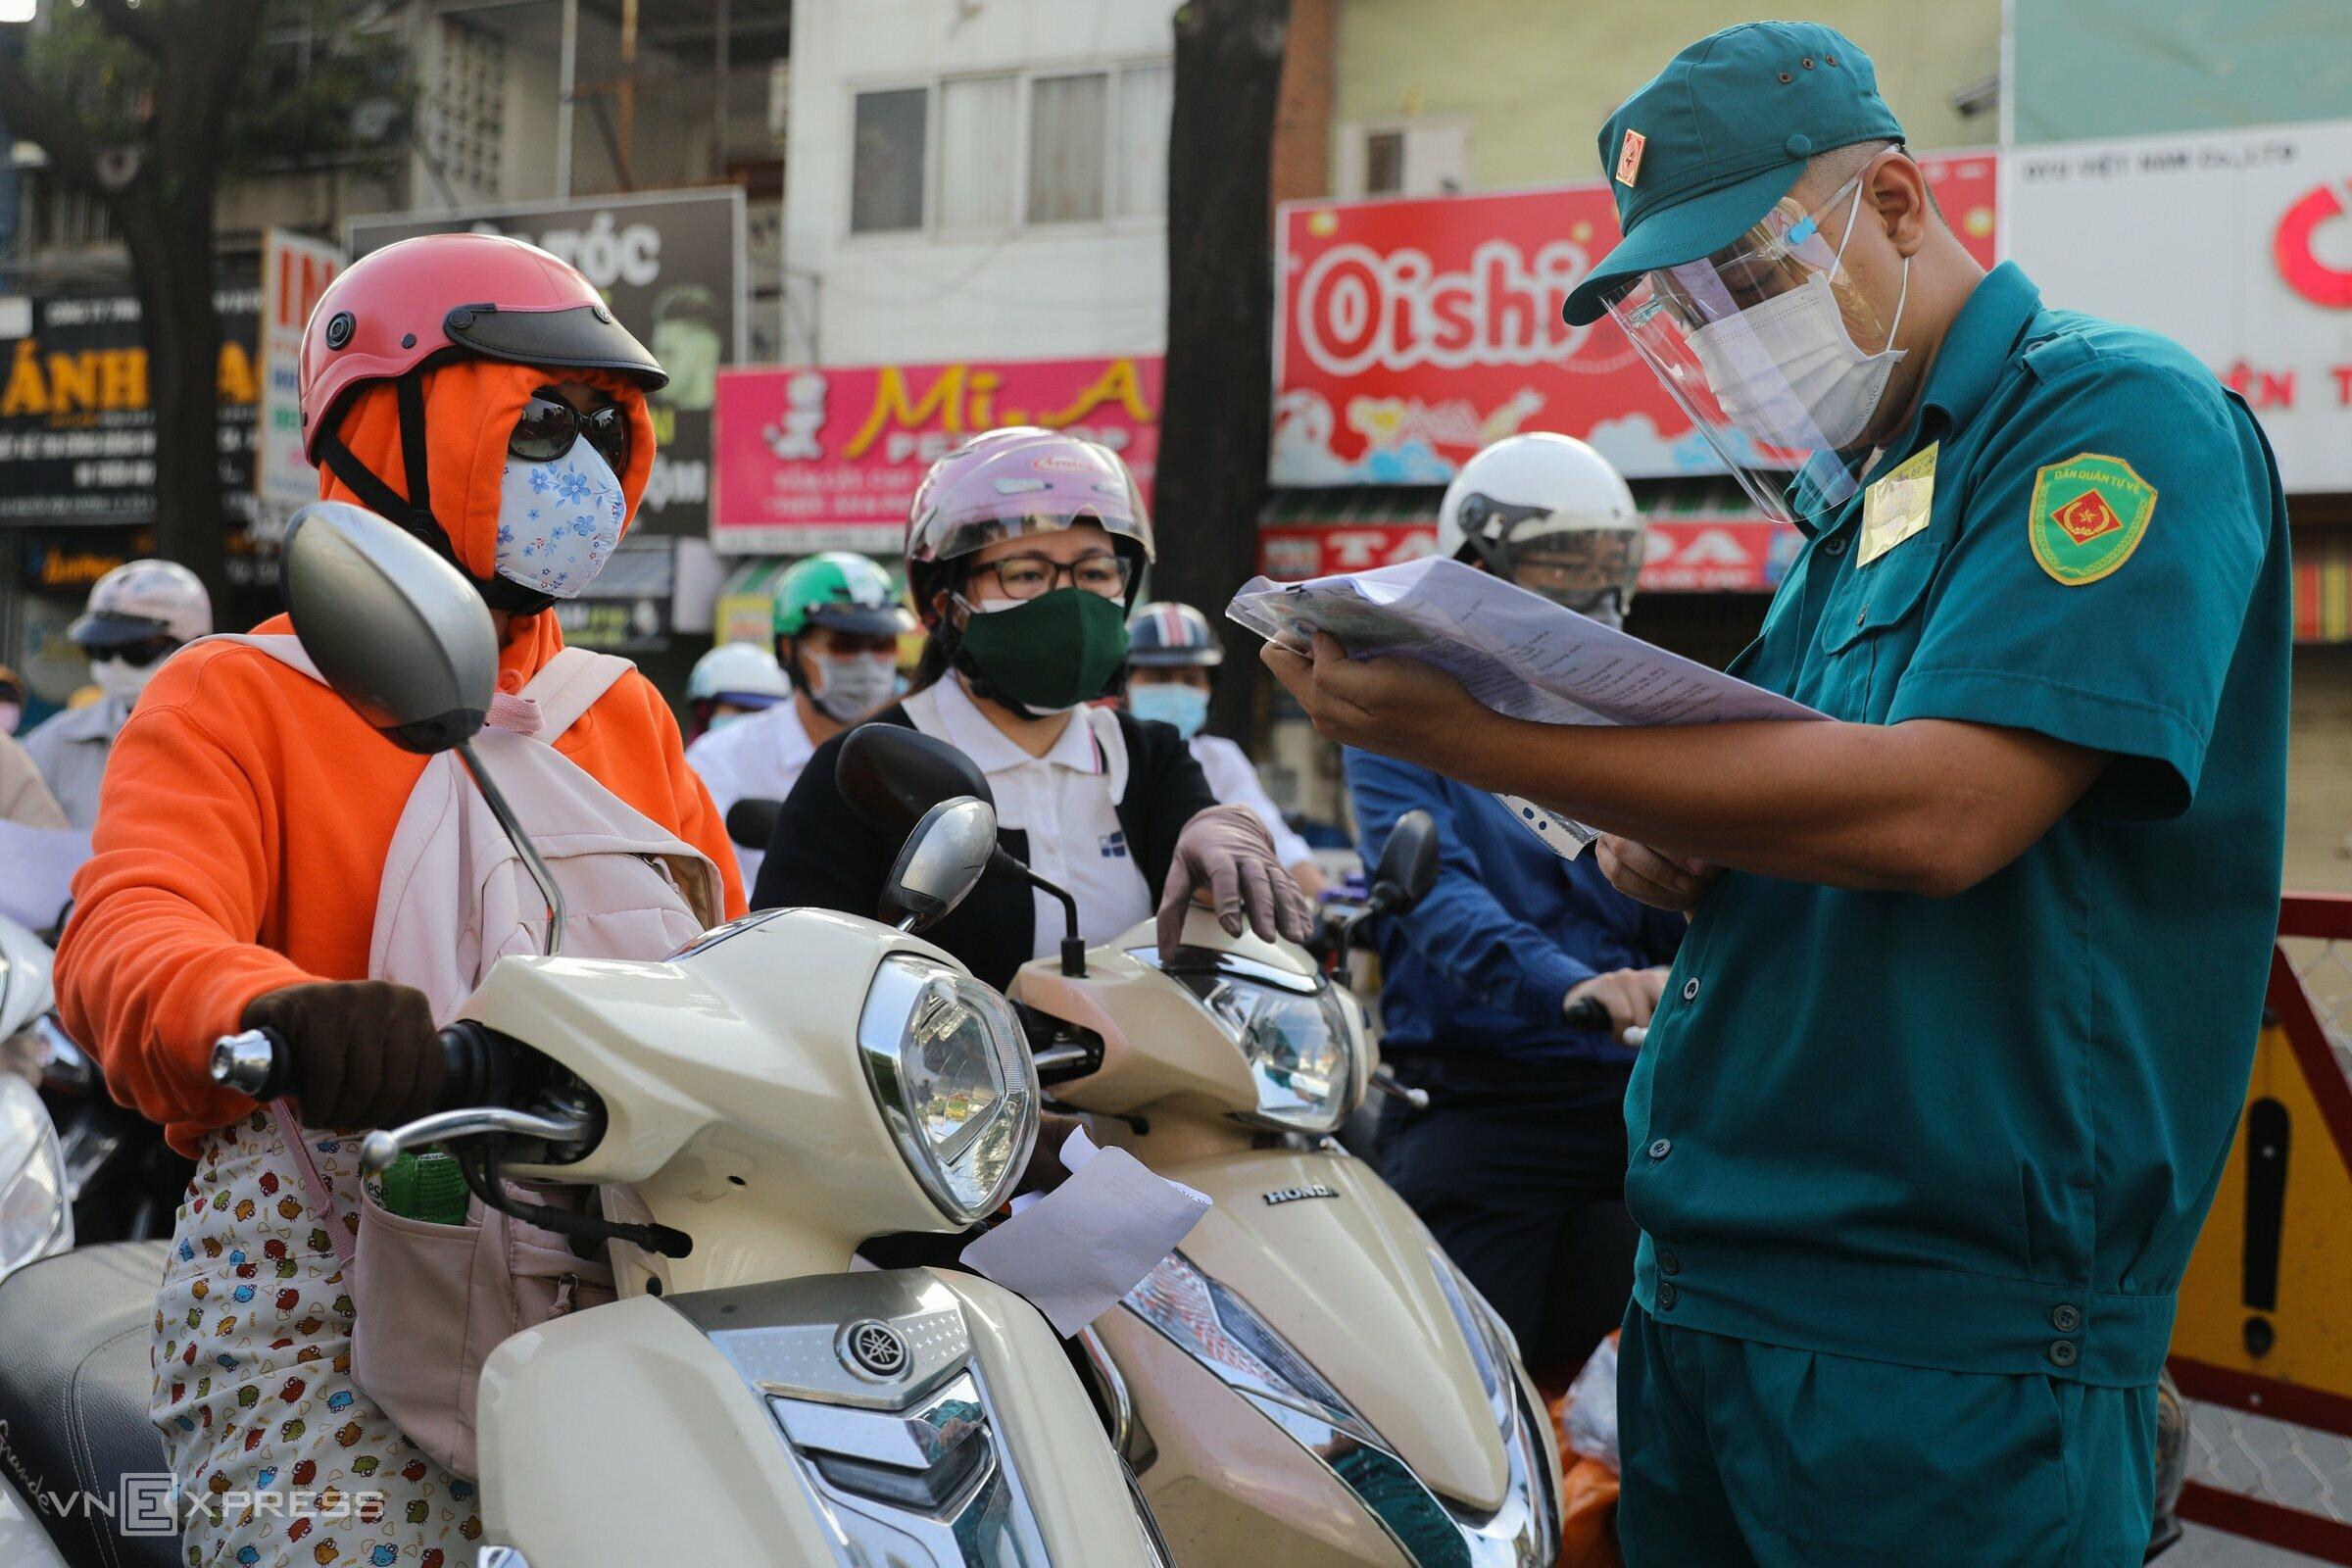 HCMC streets bustle despite social distancing restrictions